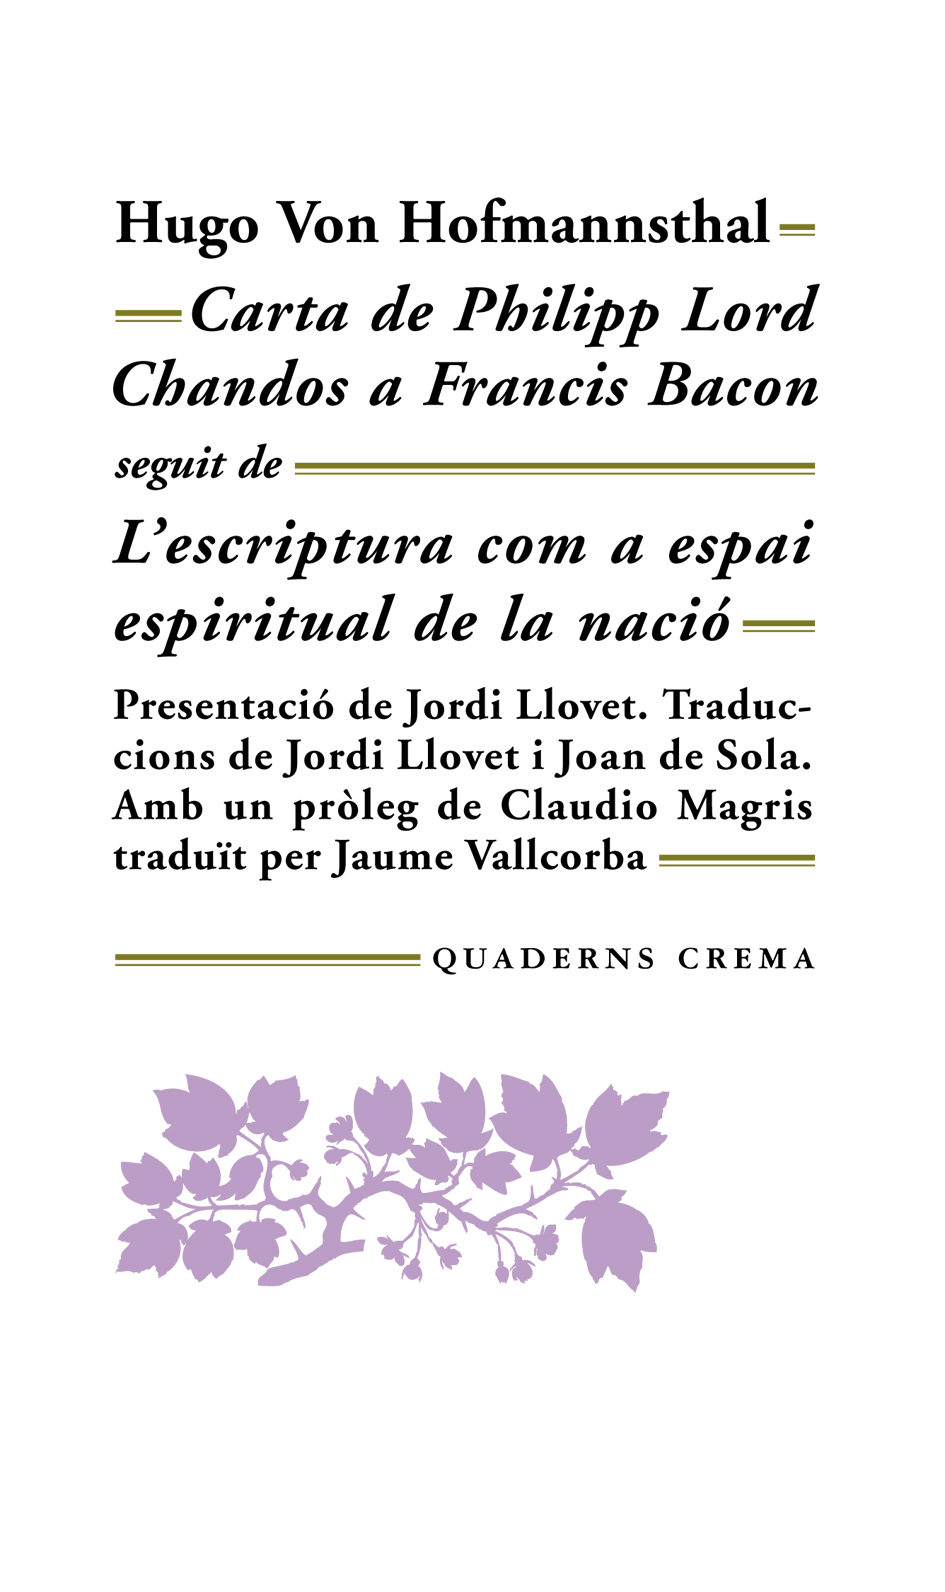 Carta De Philipp Lord Chandos A Francis Bacon. L Escriptura Com A Espa - Hofmannsthal Hugo Von